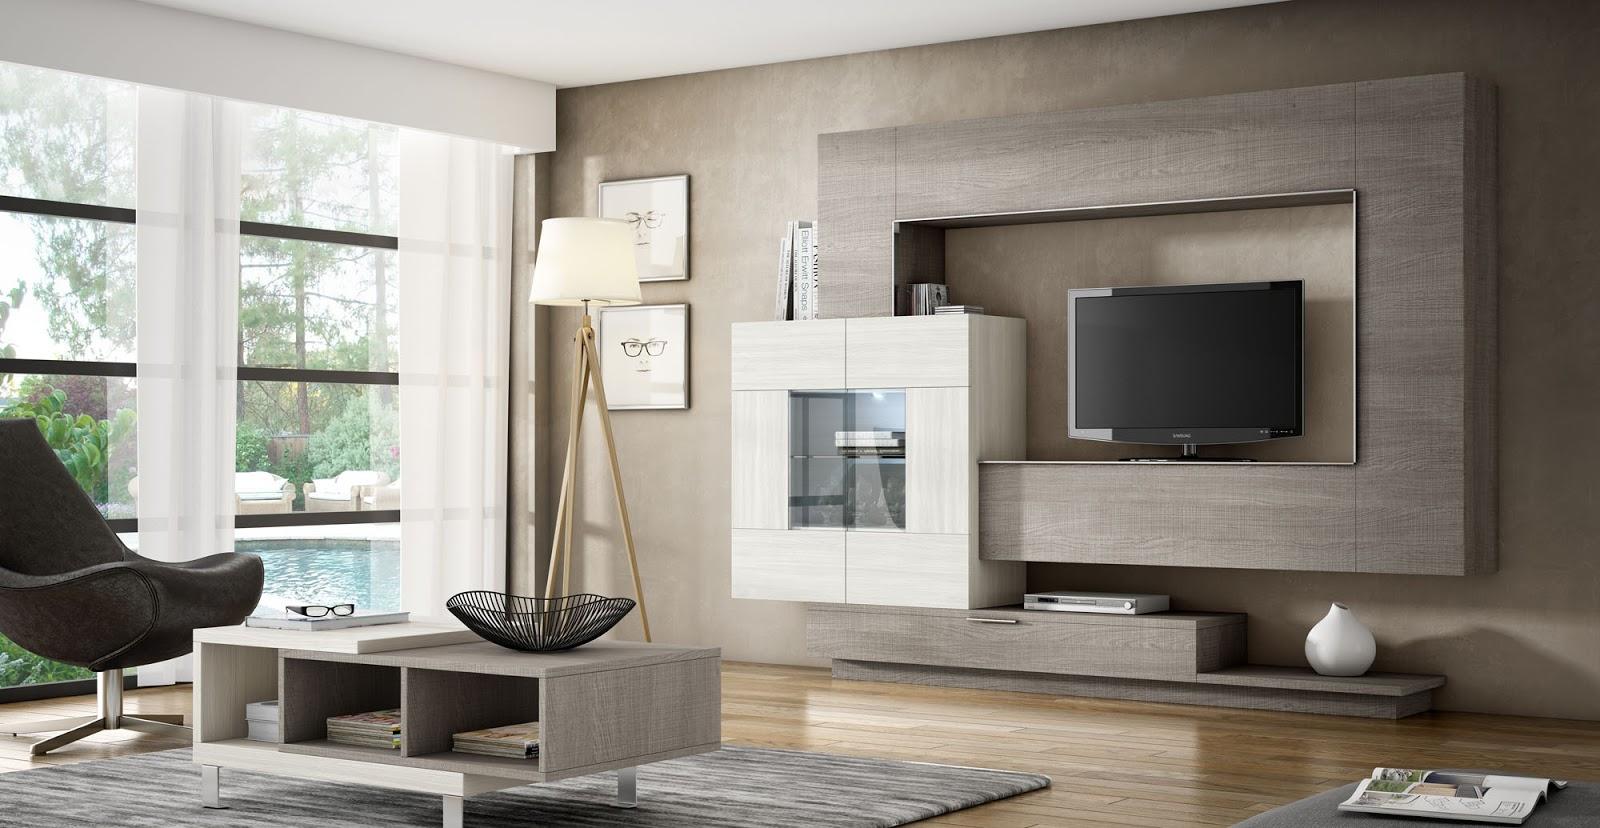 Muebles de moda colecci n next para los m s modernos for Muebles modernos 2015